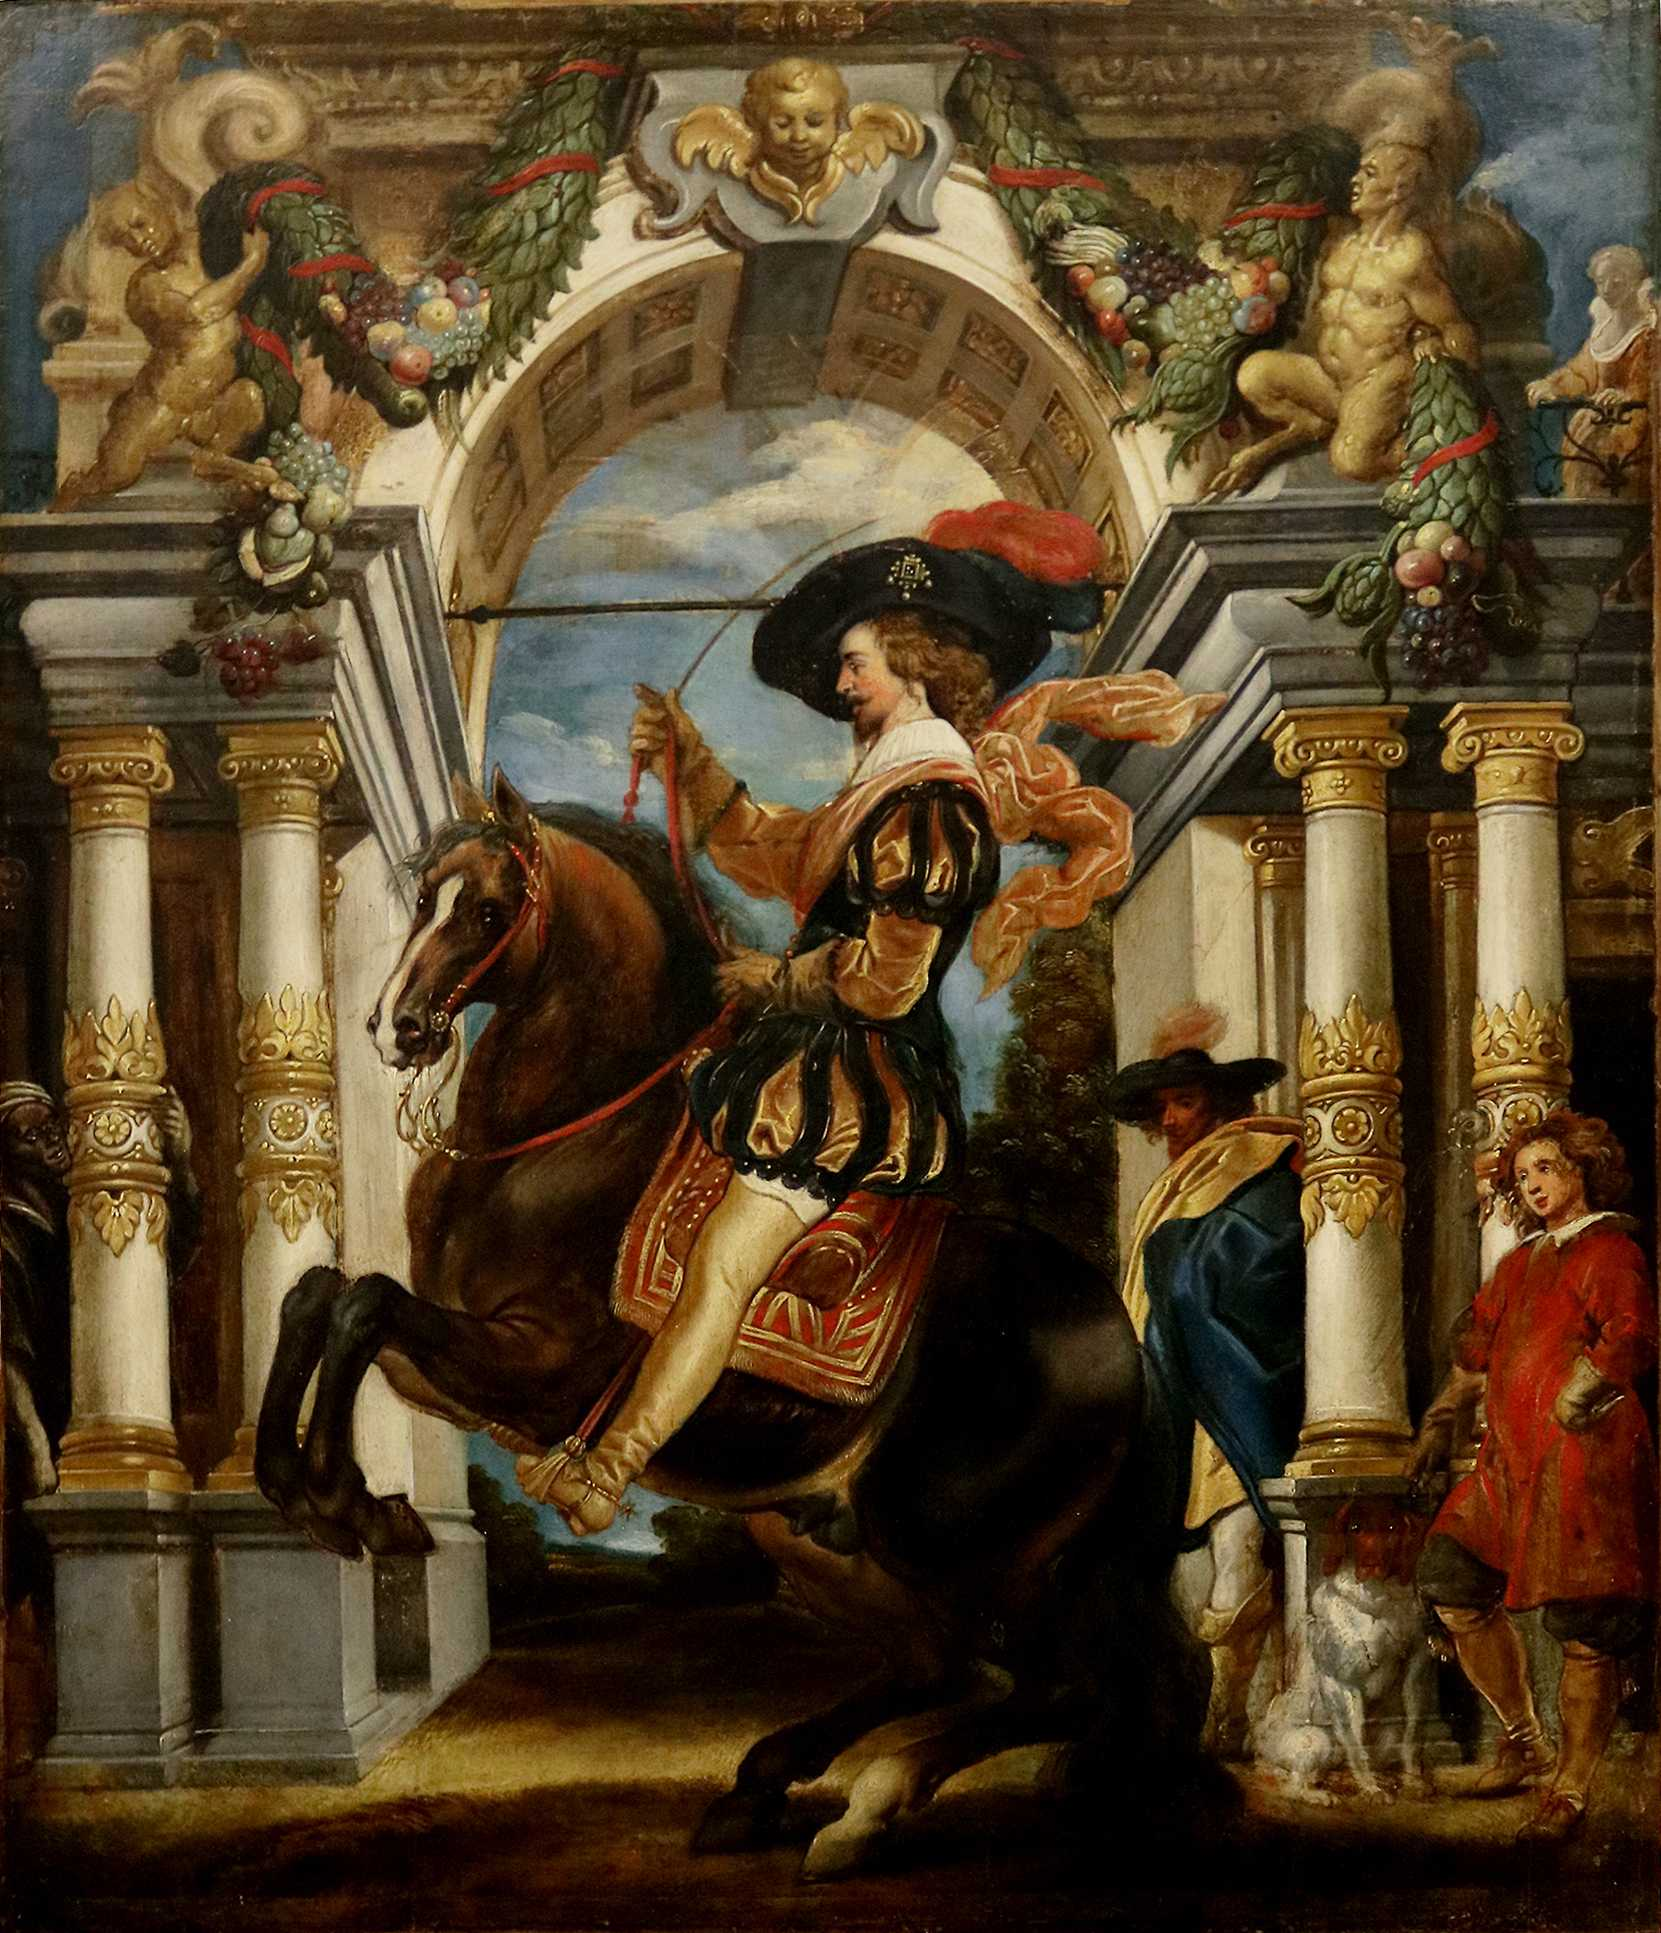 Gentleman on Horseback